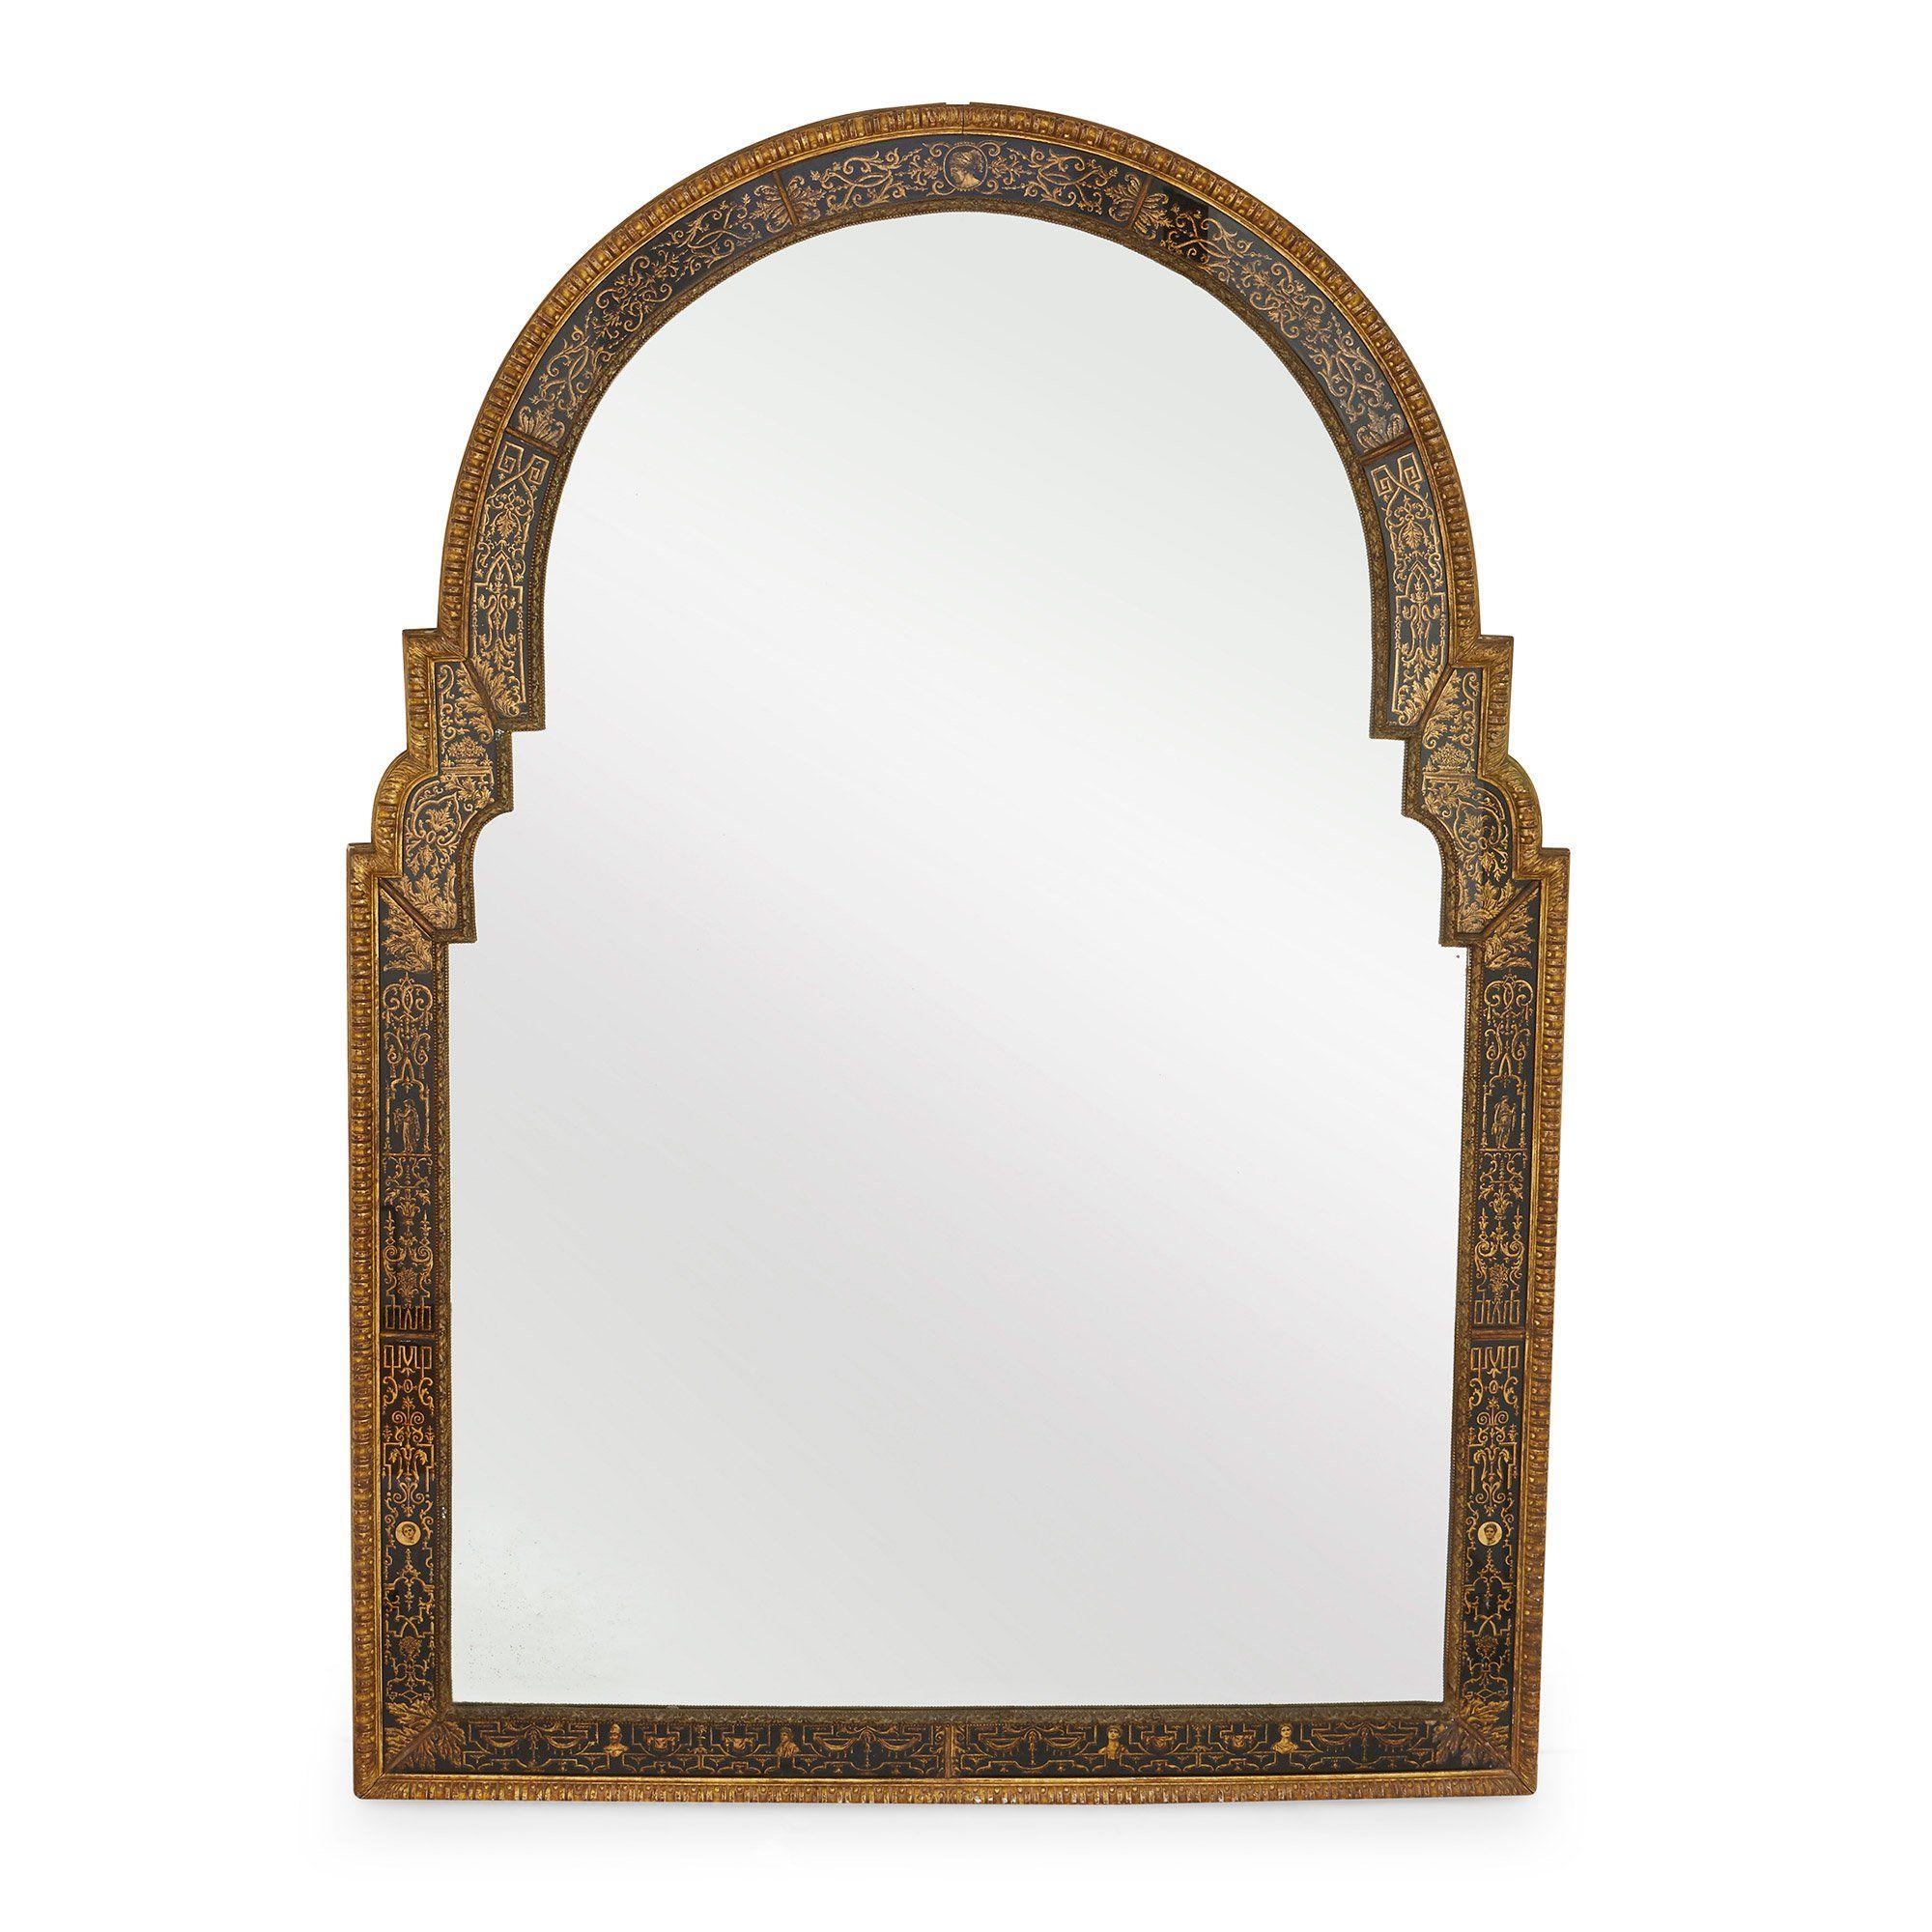 Italian Giltwood Louis Xiv Style Antique Mirror Mayfair